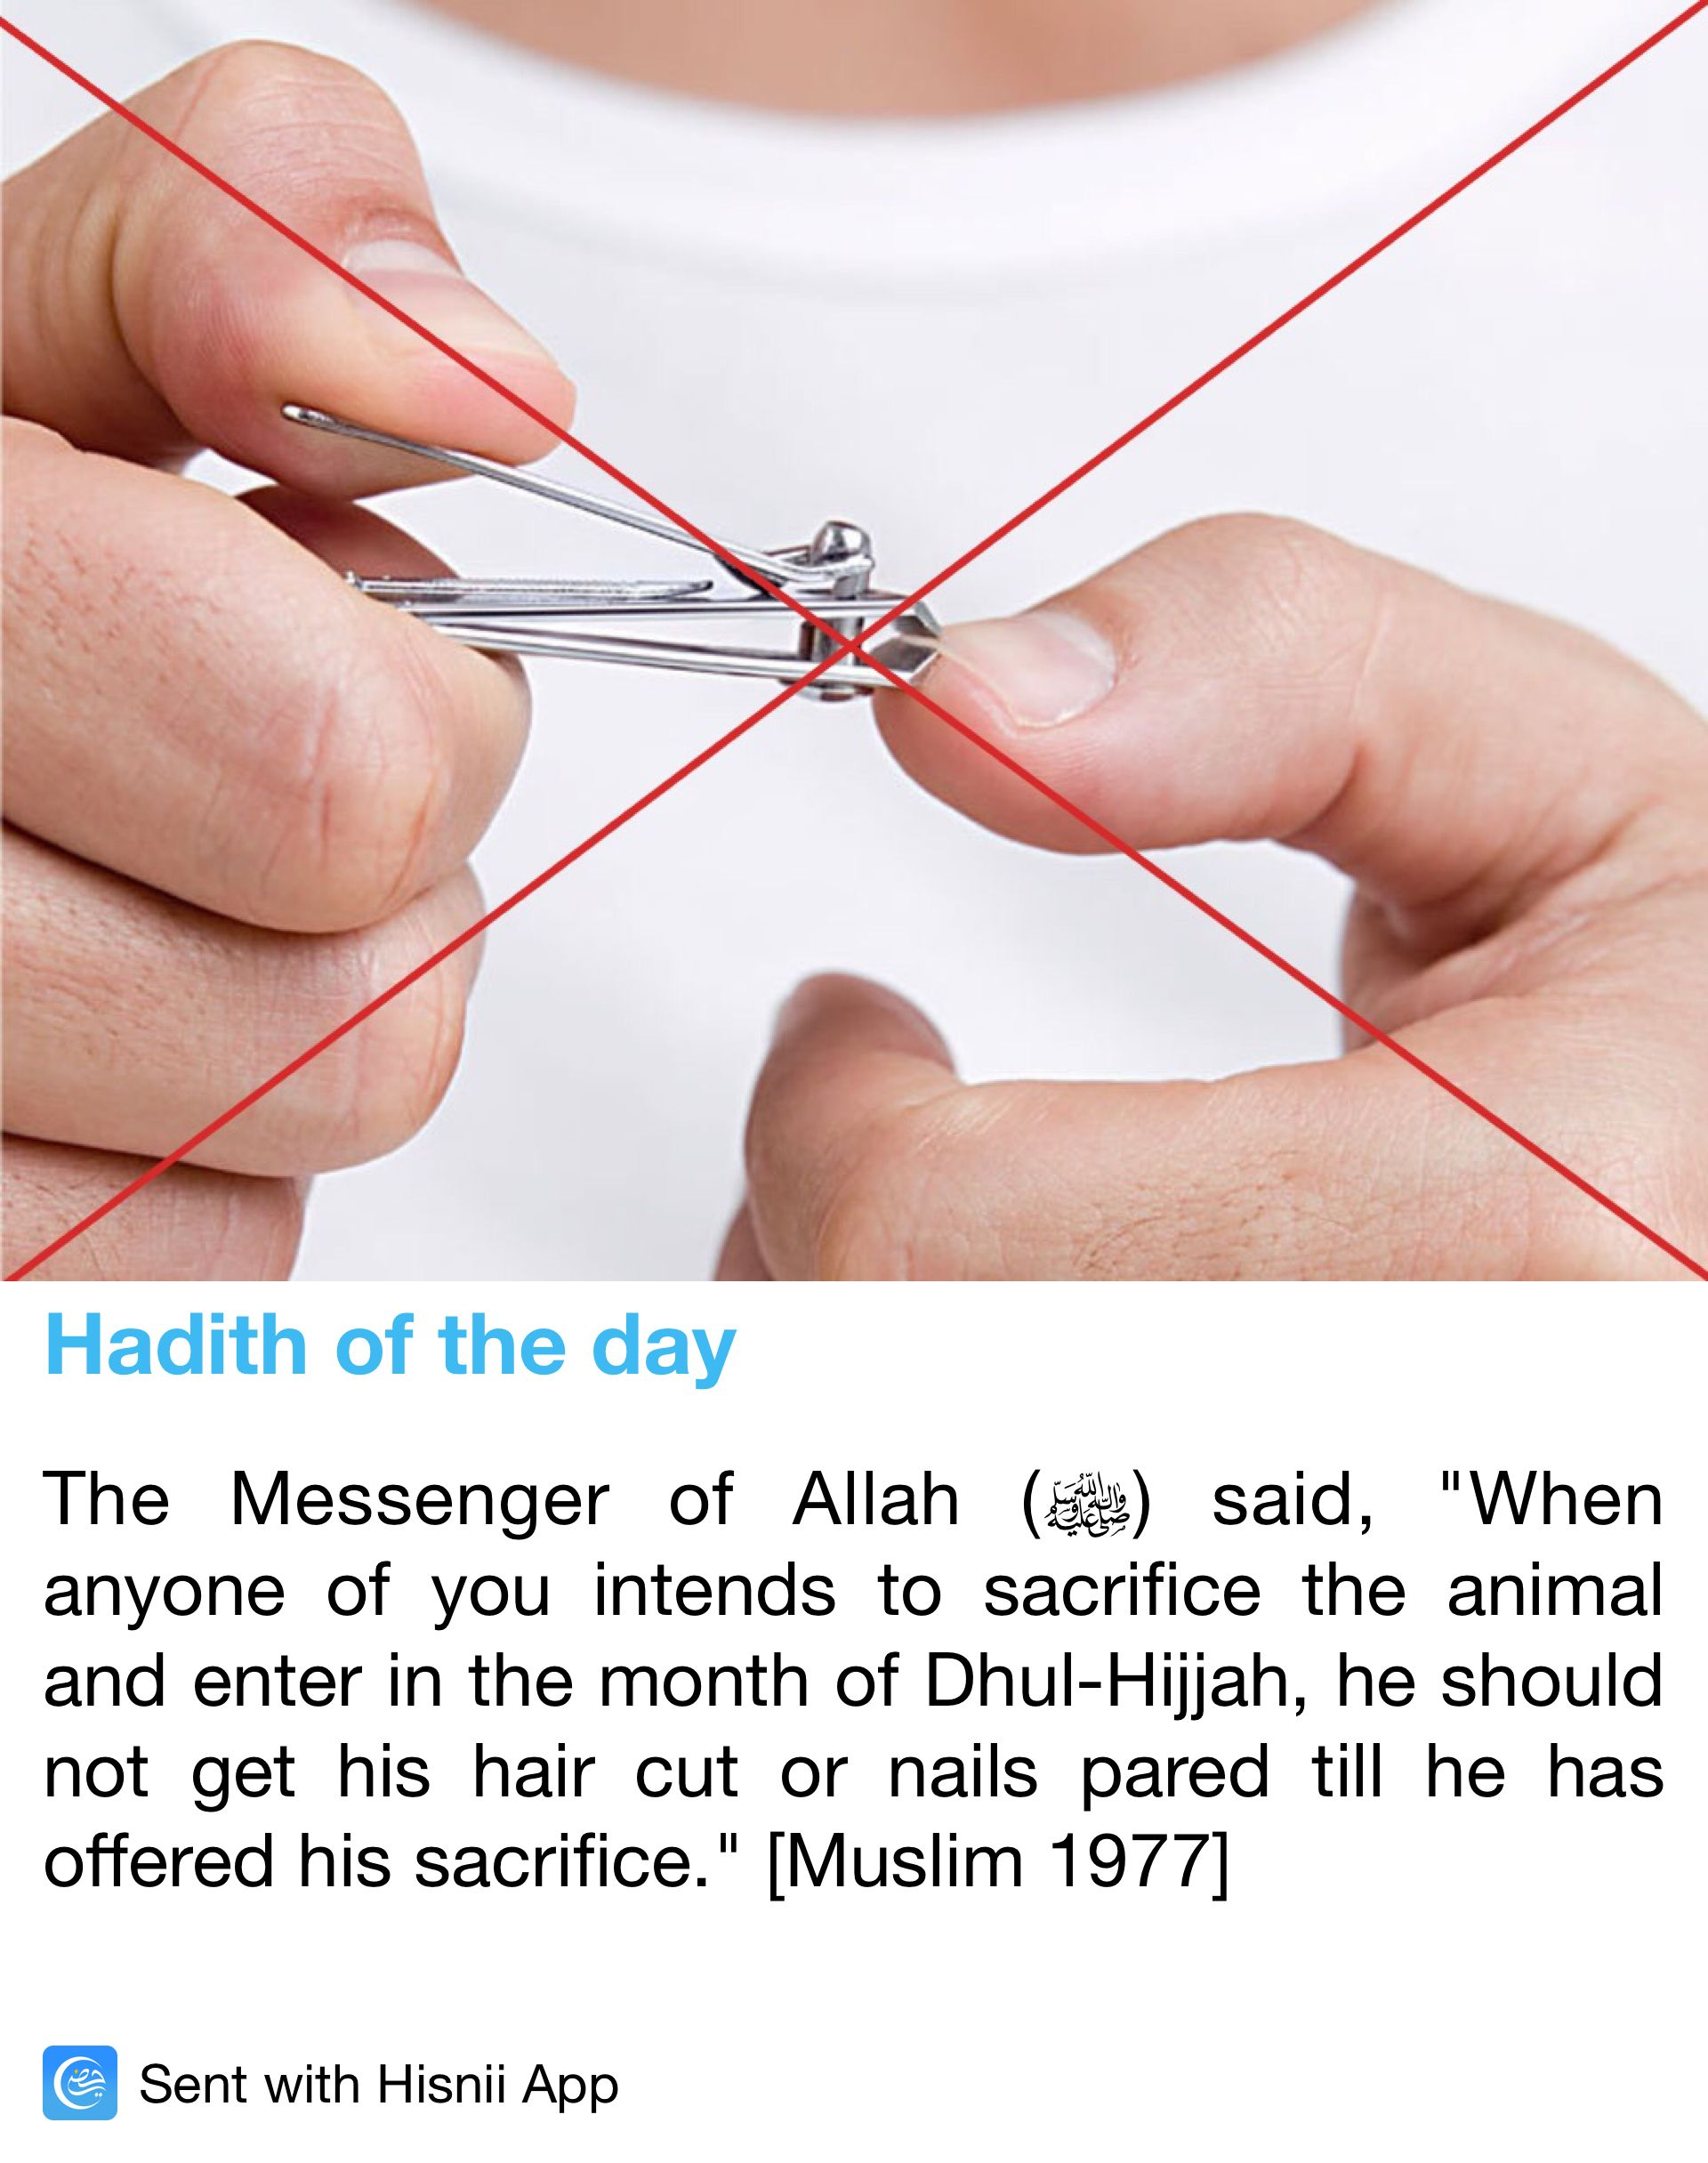 Pin on Prophet Muhammad (pbuh), Hazrat Ali (ra) hadith and quotes